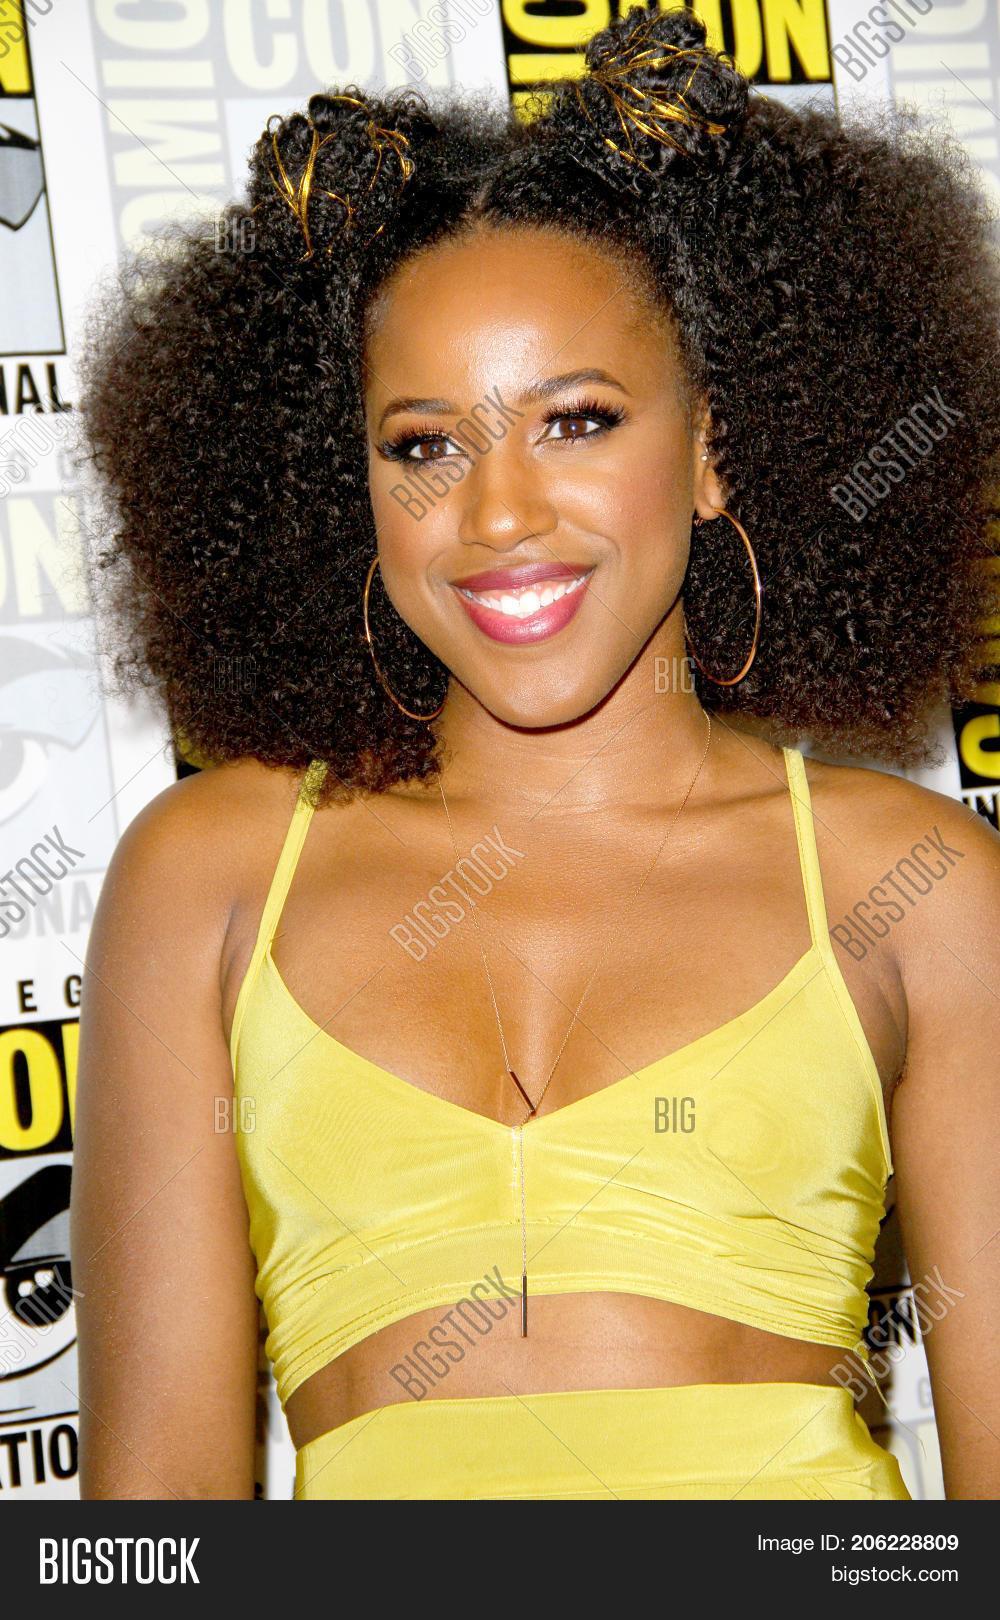 Ashanti Bromfield celebritypictures wiki